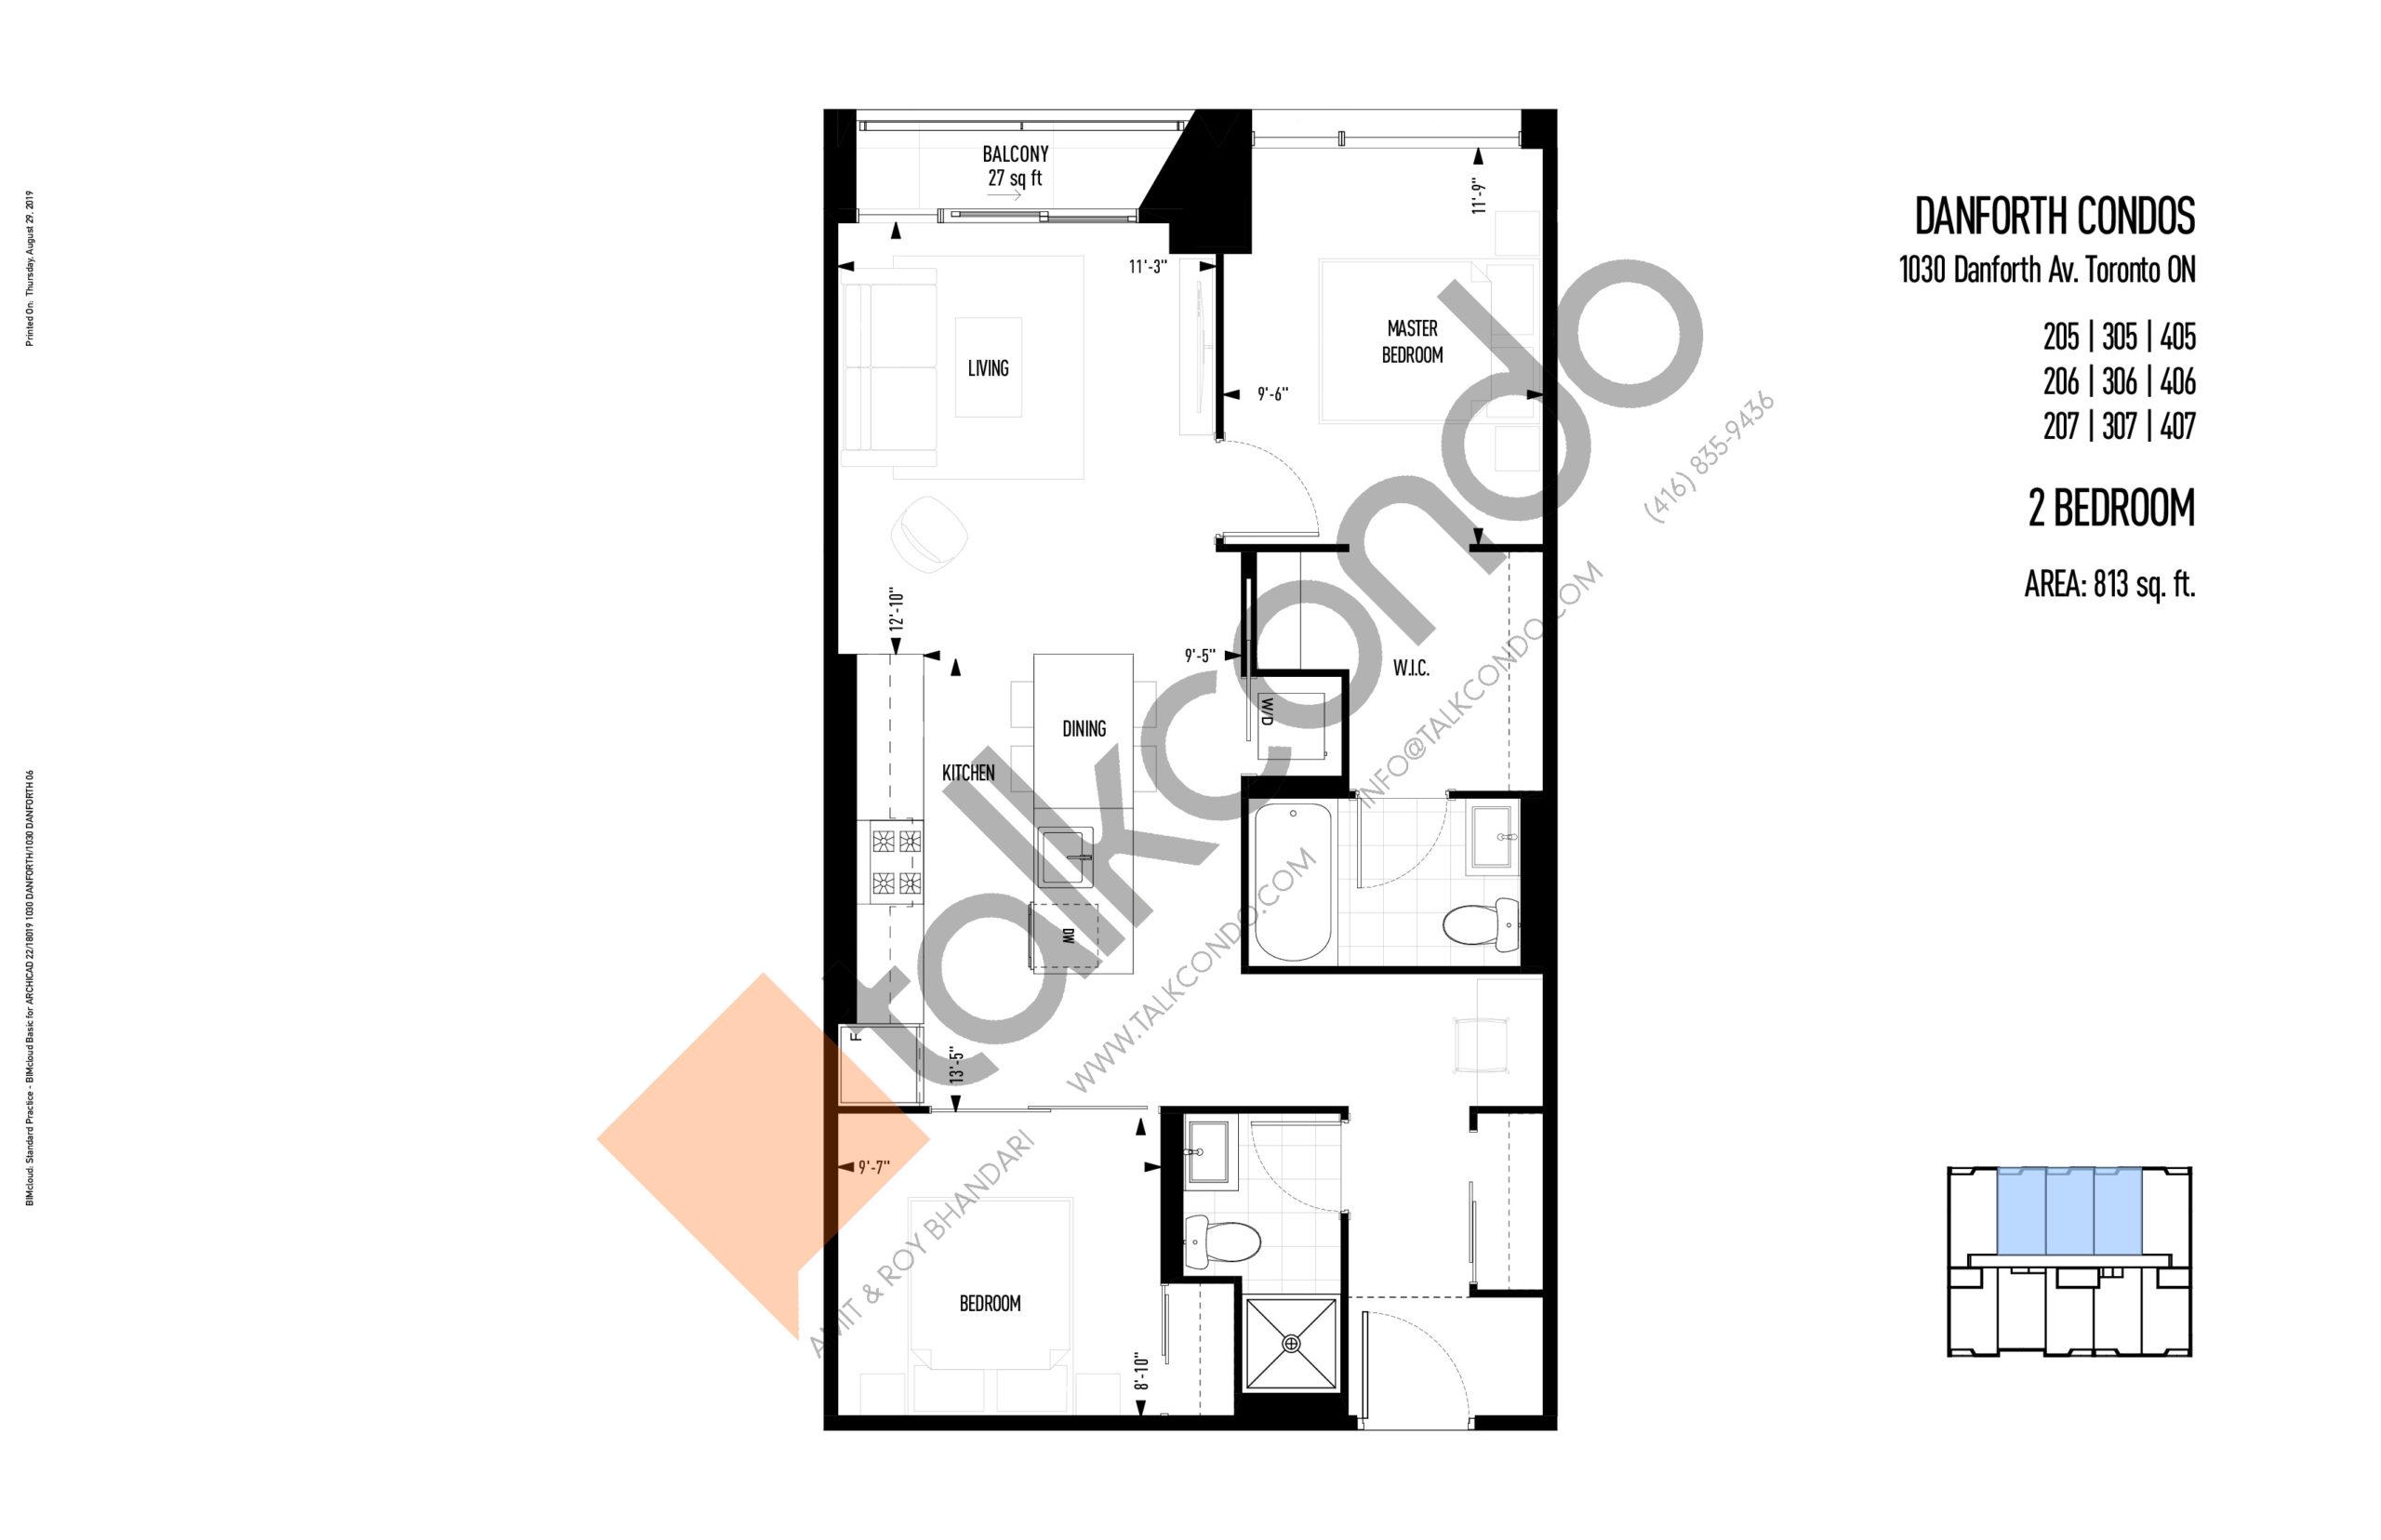 205   305   405   206   306   406   207   307   407 Floor Plan at THEO Condos - 813 sq.ft